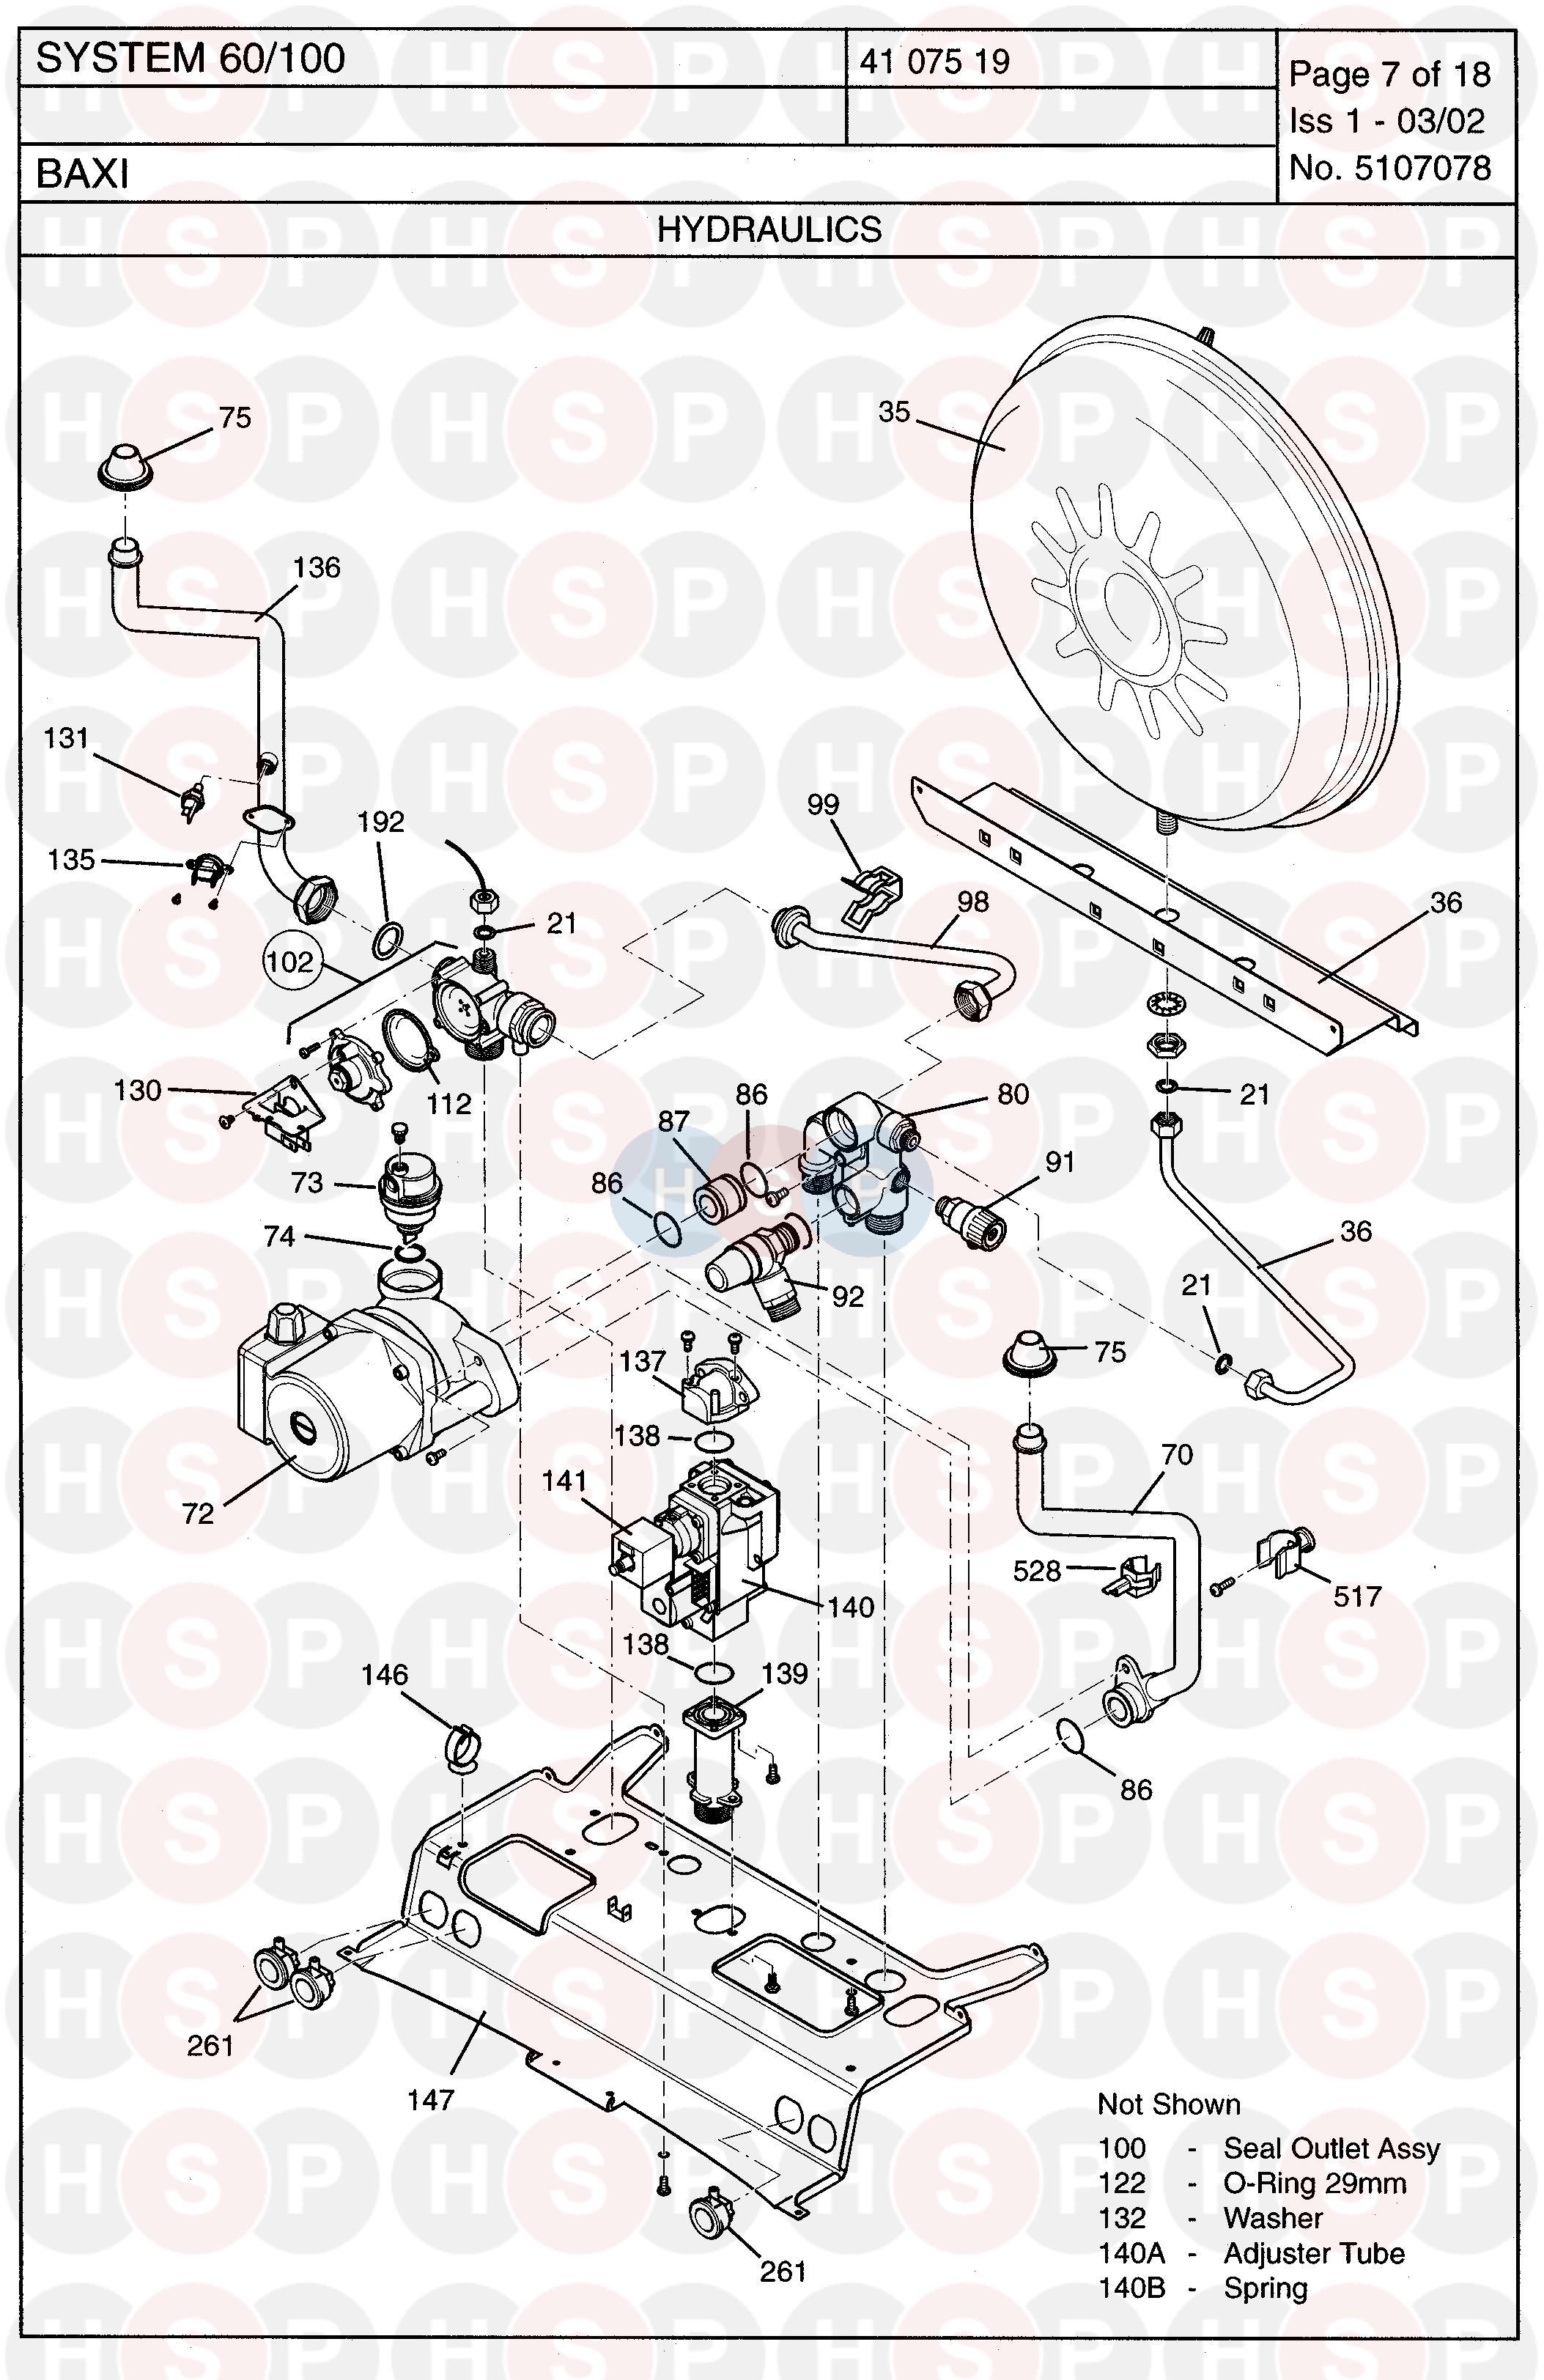 Megaflow wiring diagram y plan nos engine diagram main wiring megaflo unvented cylinder wiring diagram life style by imagehandler megaflo unvented cylinder wiring diagram megaflow wiring diagram y plan asfbconference2016 Choice Image